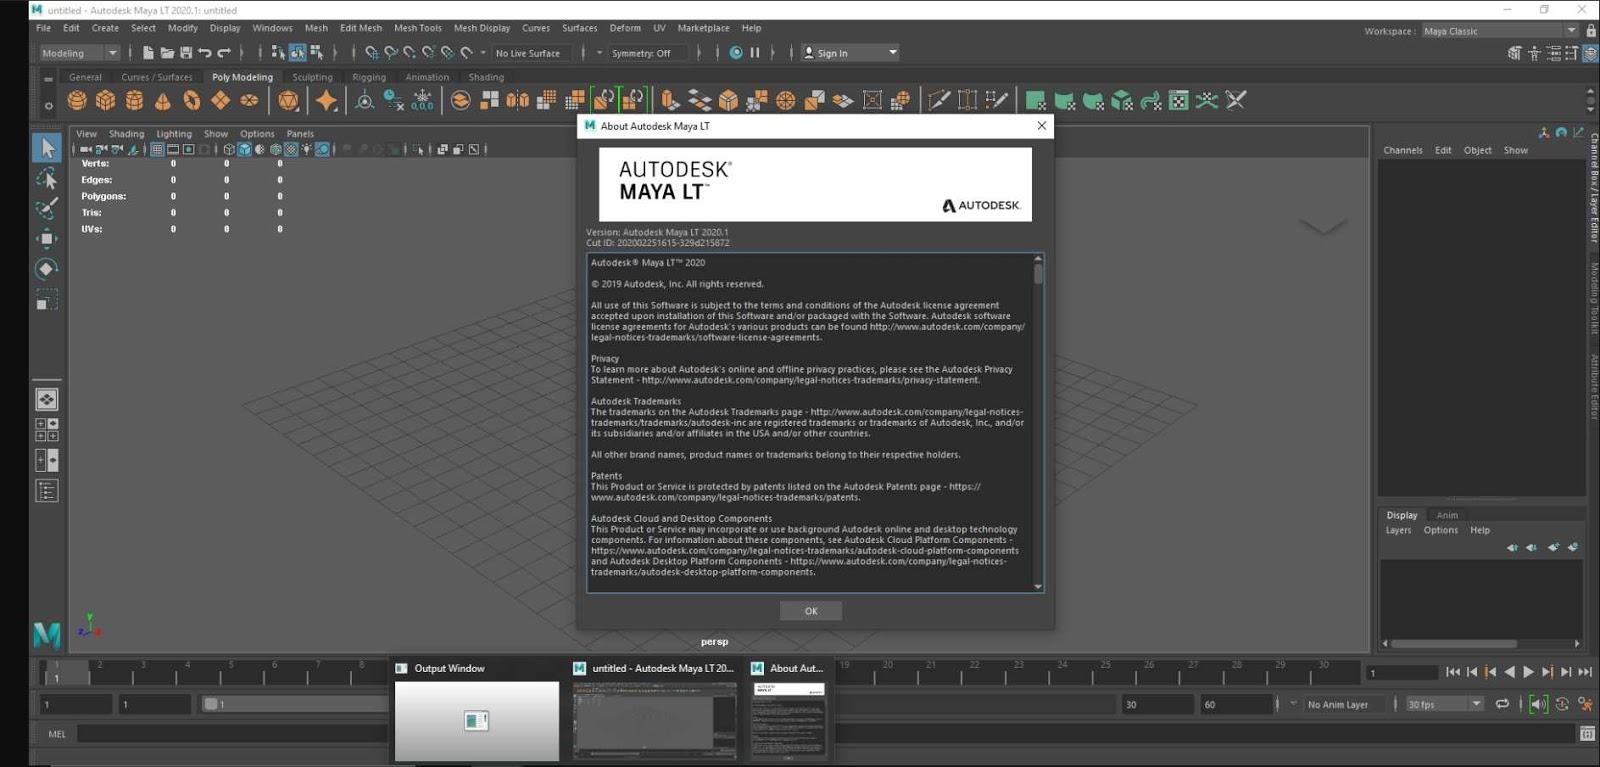 Autodesk Maya LT 2020.1